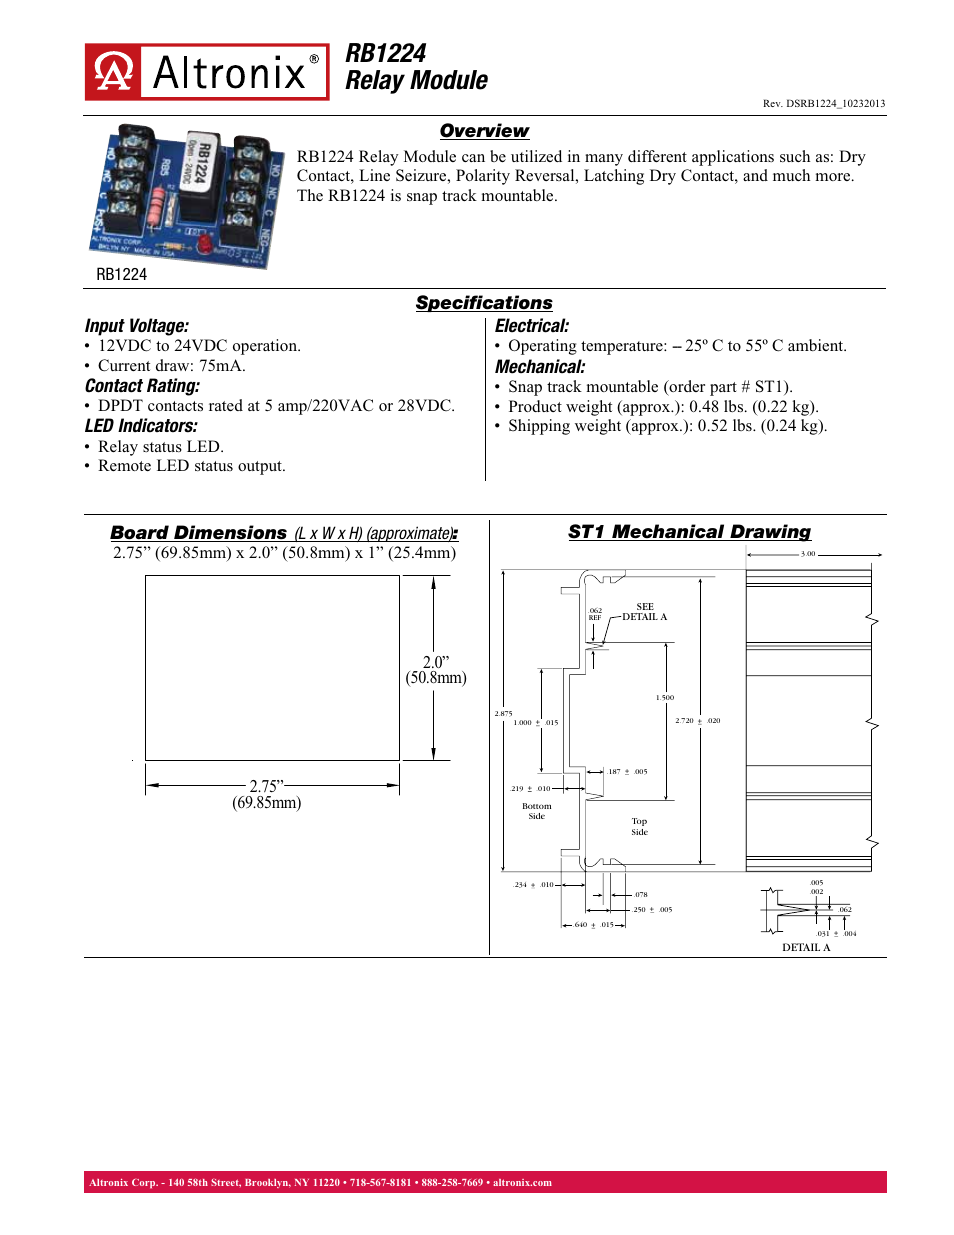 altronix rb1224 data sheet user manual 1 page rh manualsdir com Altronix Relay Module Altronix 6062 Timer Relay